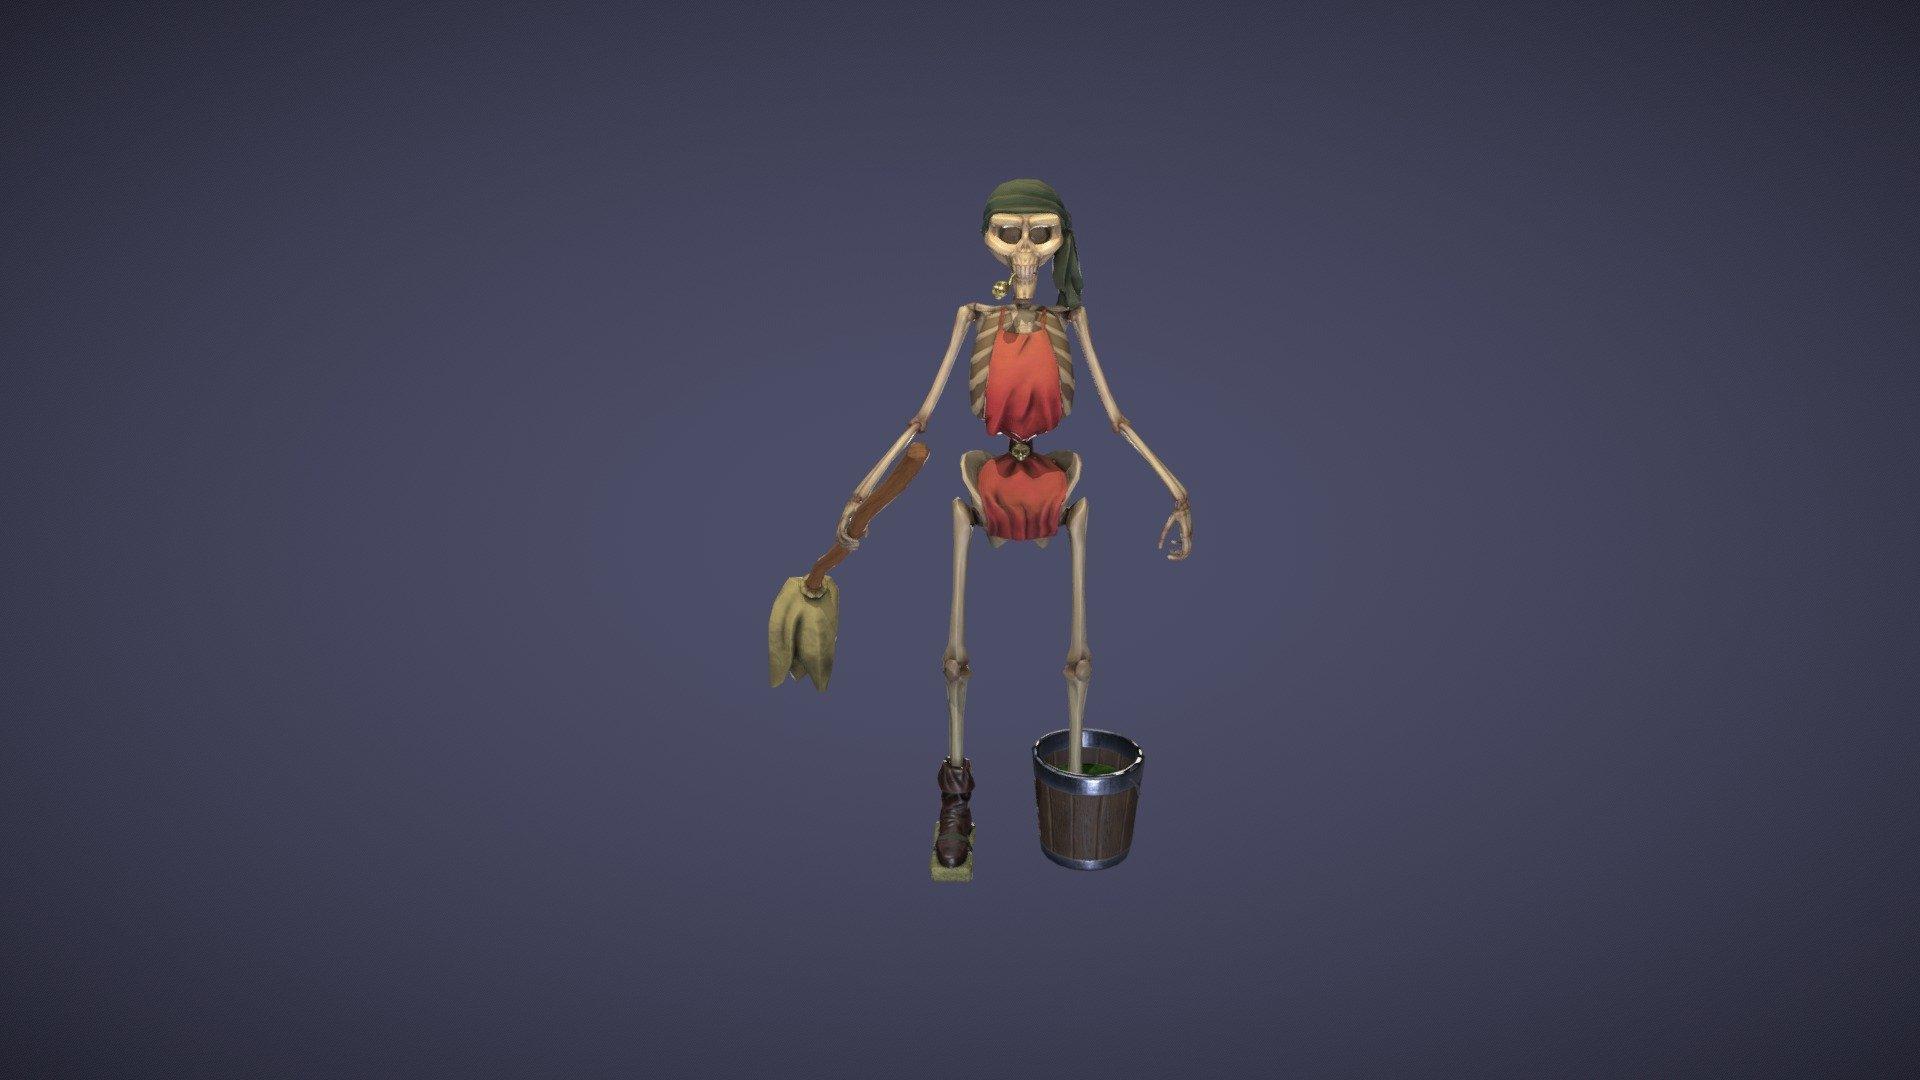 skeleton pirate heaj b2c3 bb9d2aa5dc7a4f51a ec4cfd65